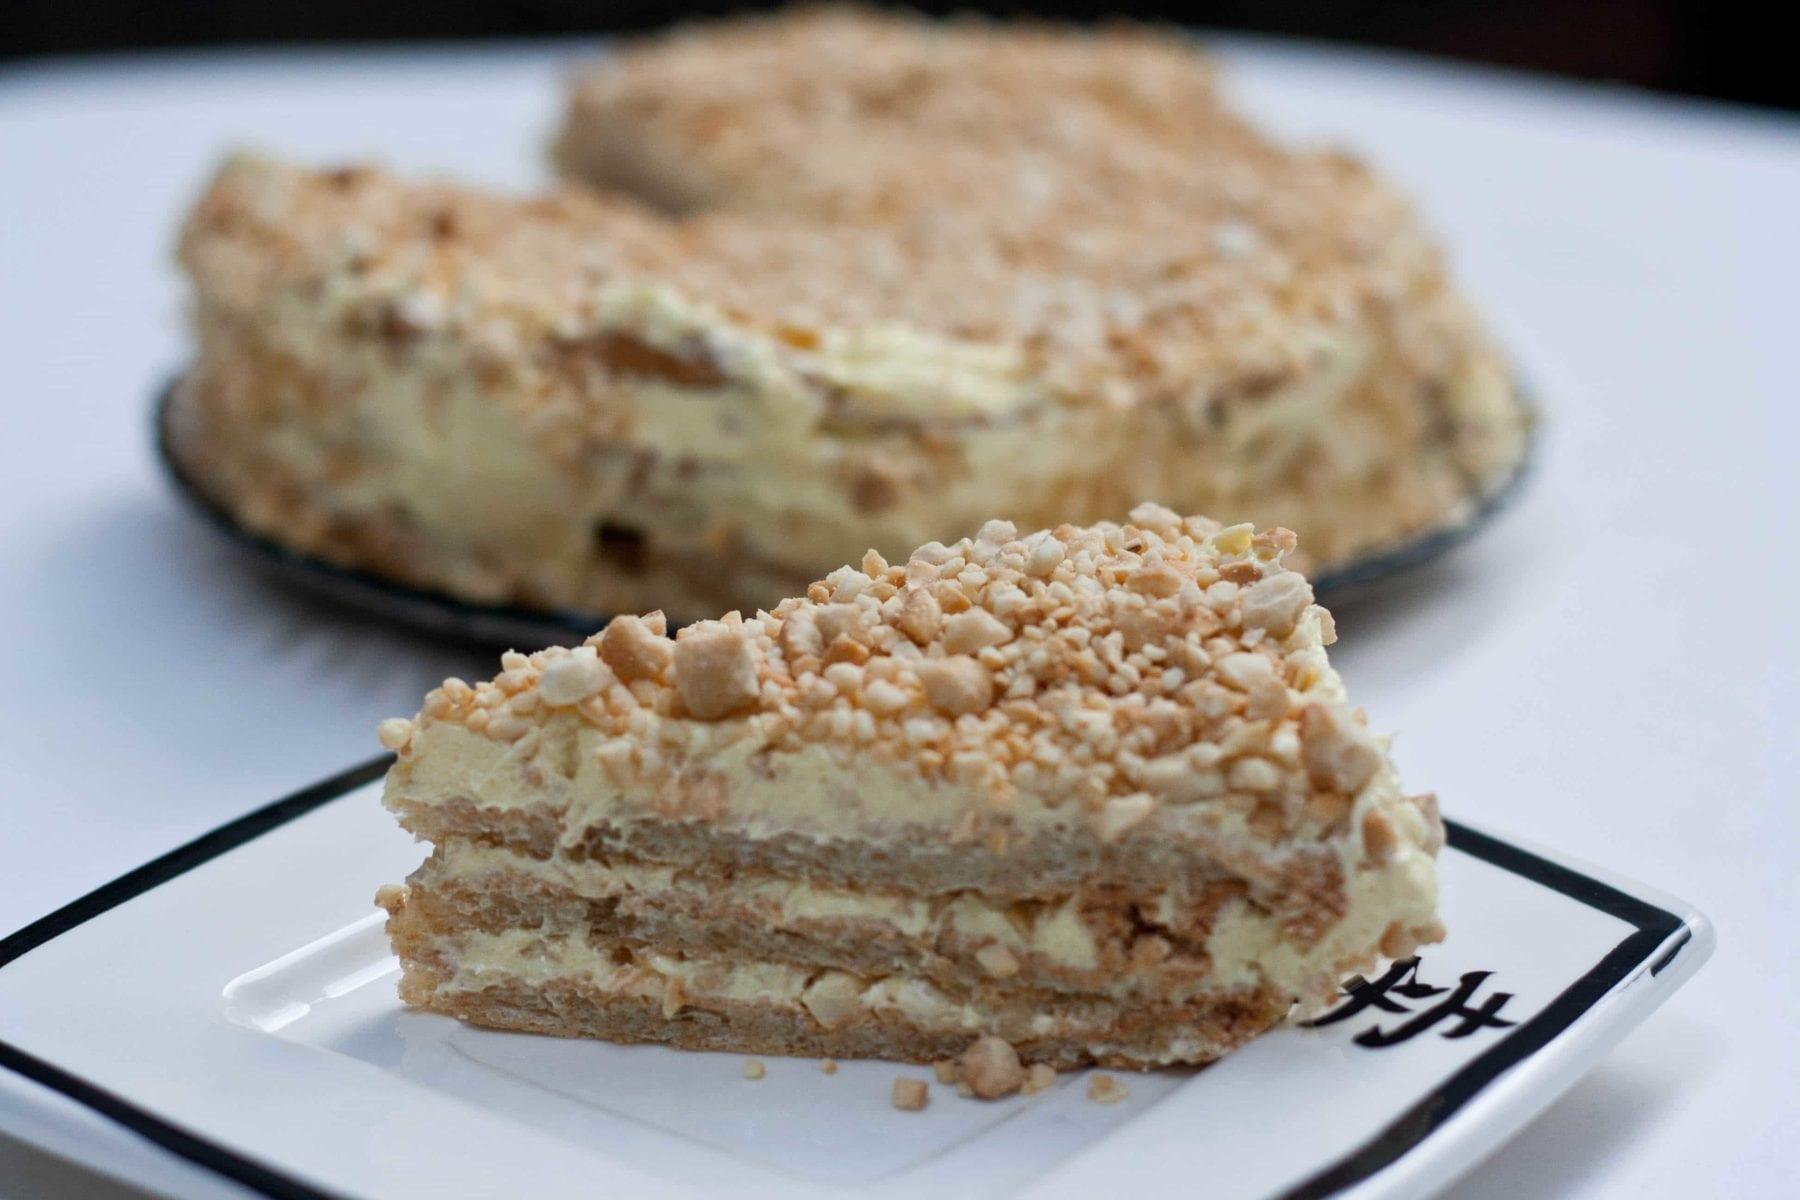 Daring Bakers November 2011 – Sans Rival Cake